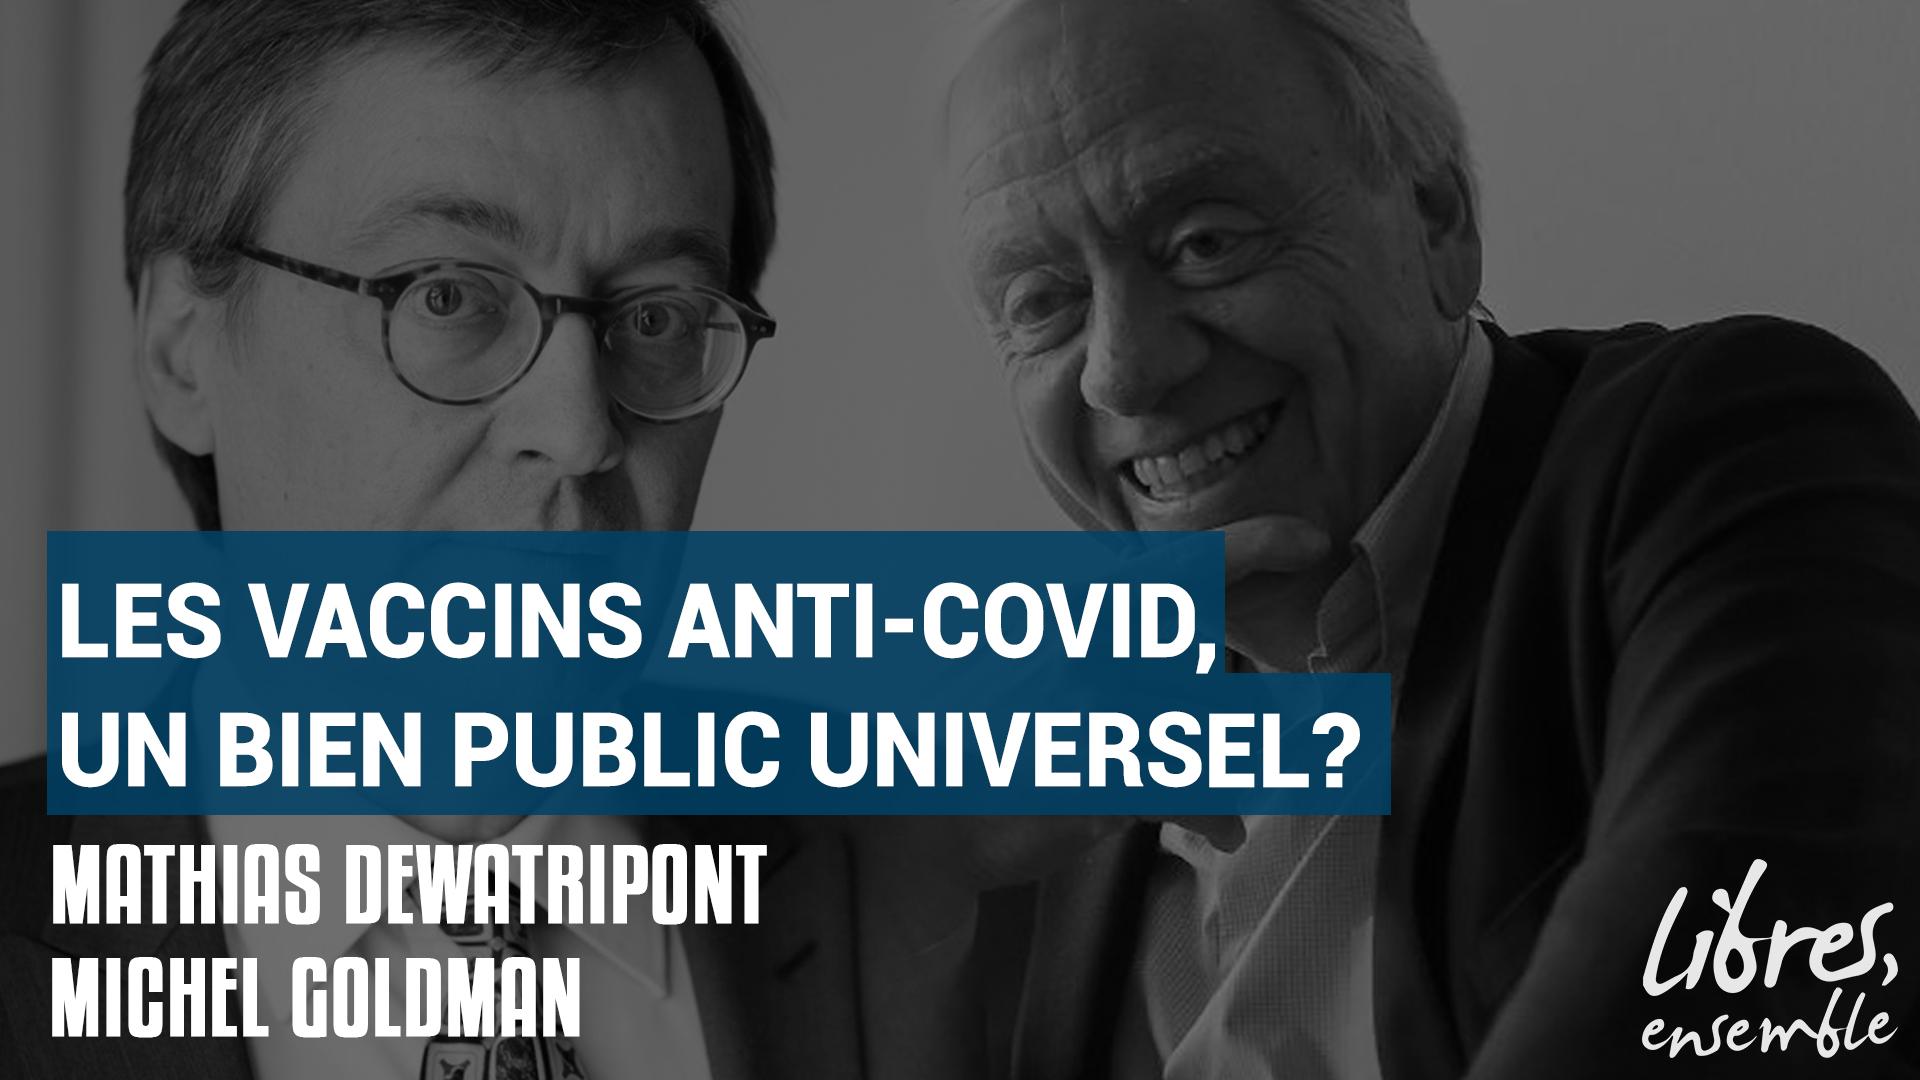 Les vaccins anti-Covid, un bien public universel?